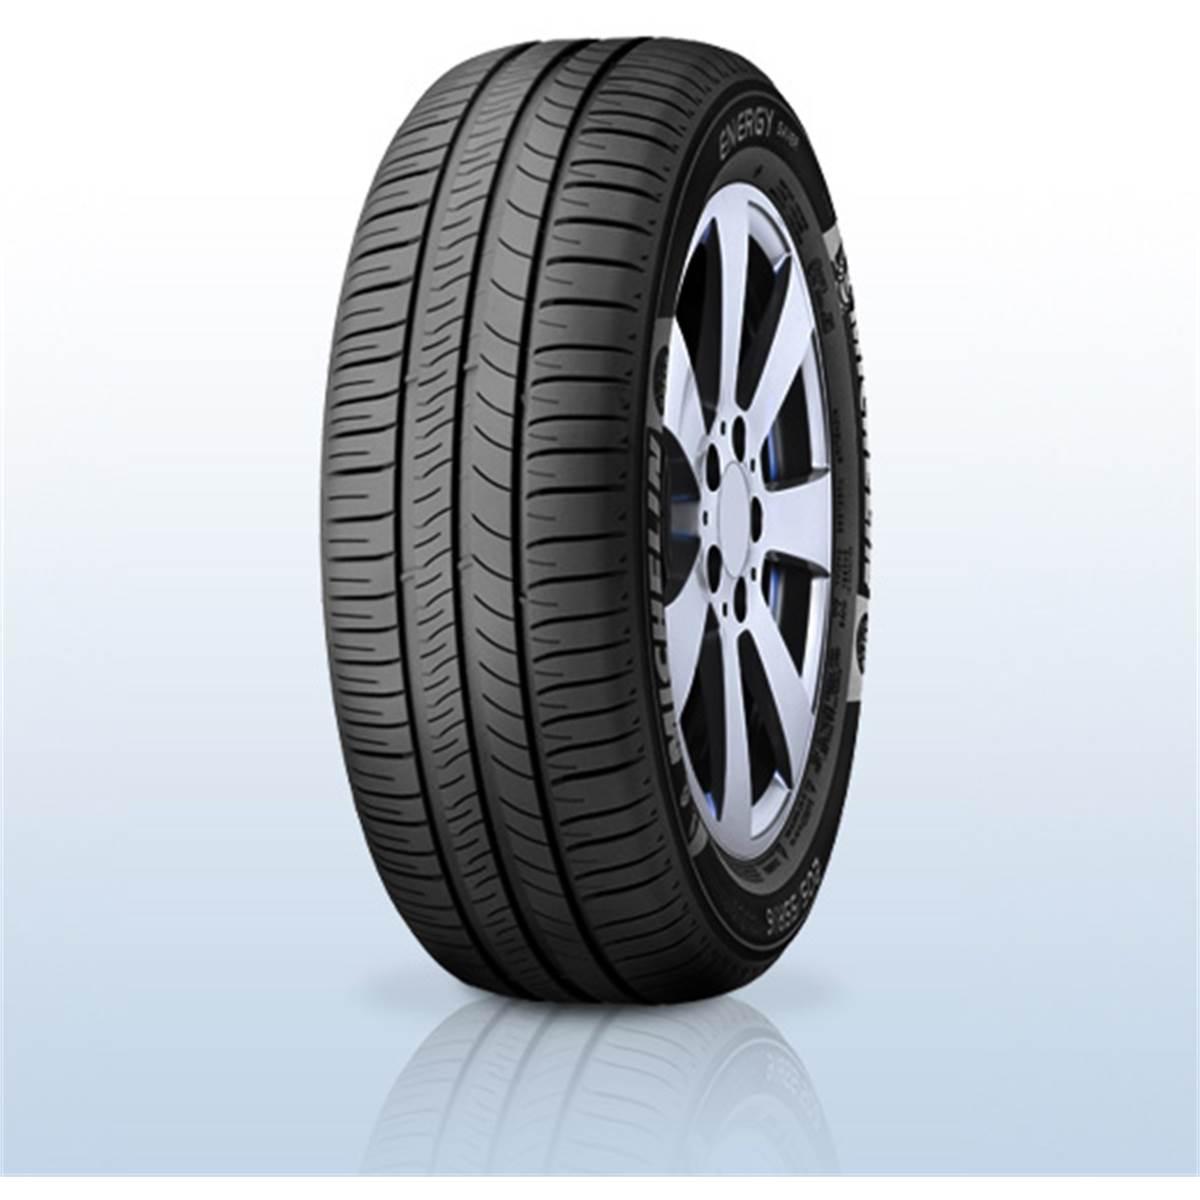 Pneu Michelin 195/60R15 88T Energy Saver +